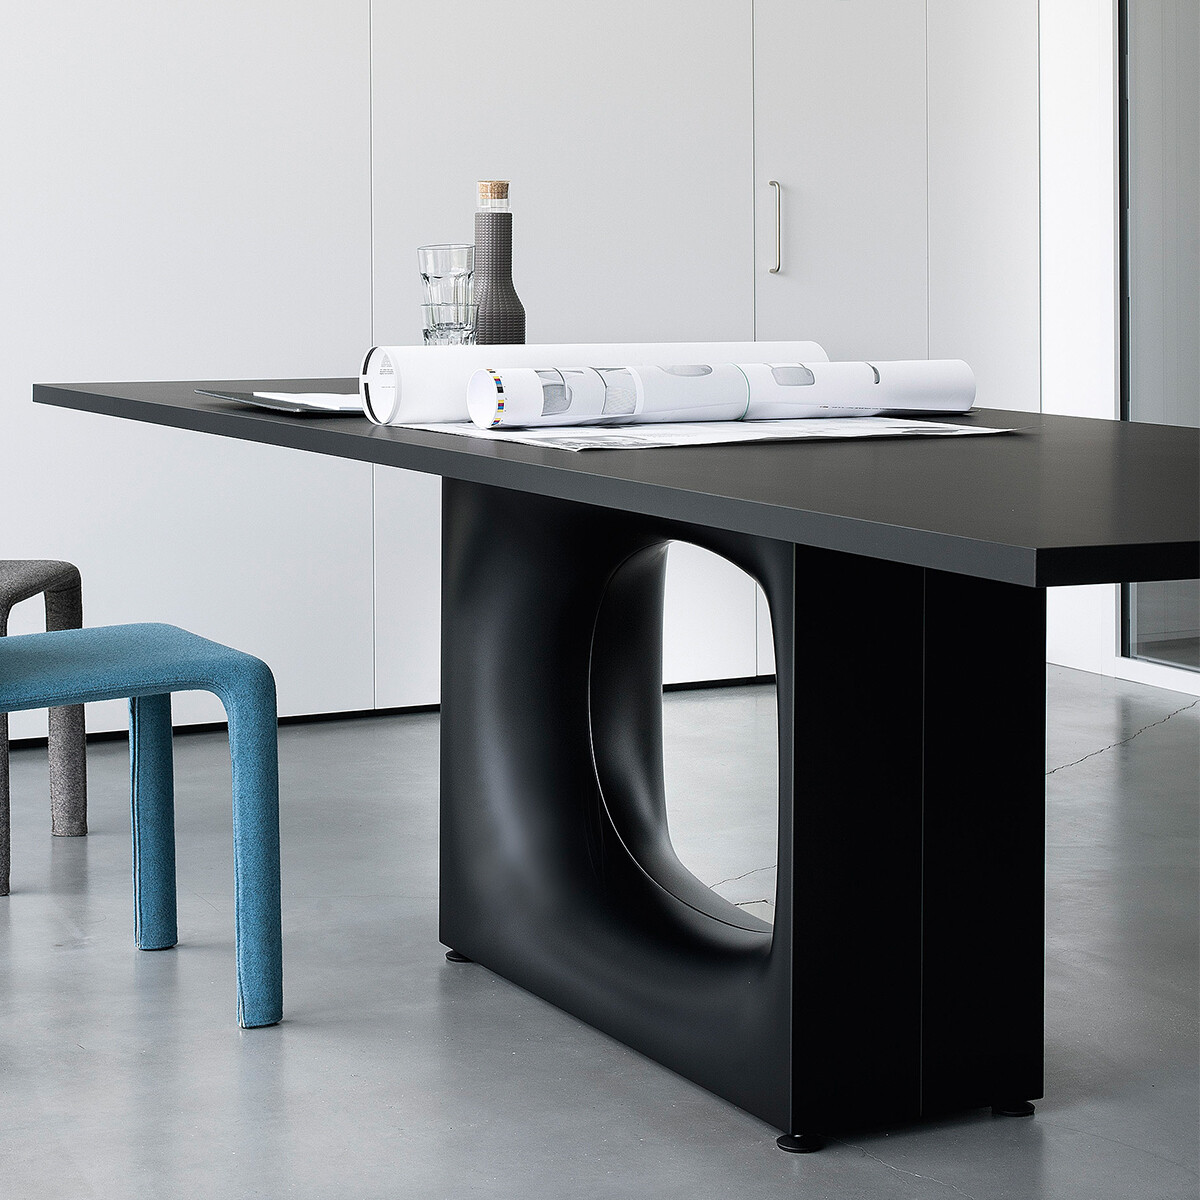 kristalia holo esstisch 250 cm mit fenixplatte casa de. Black Bedroom Furniture Sets. Home Design Ideas